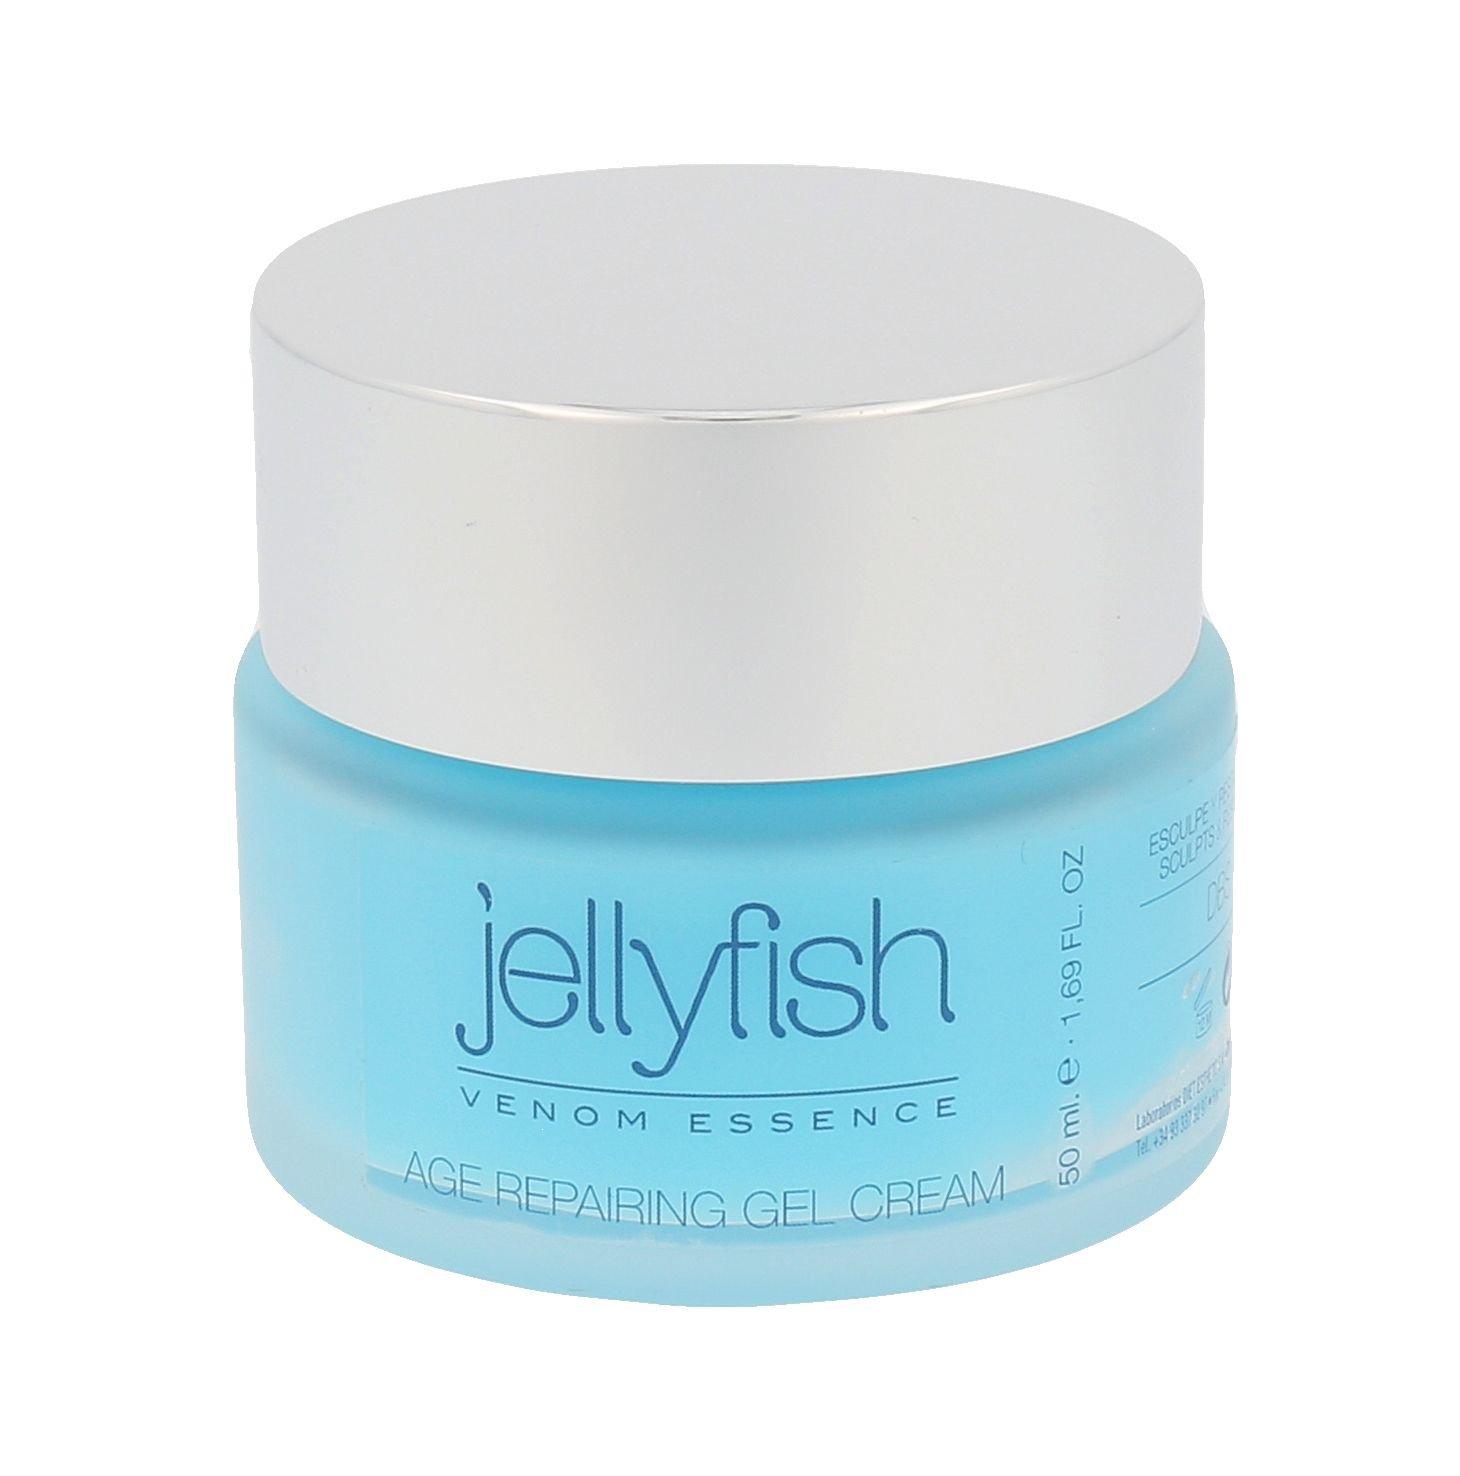 Diet Esthetic Jellyfish Venom Essence Gel Cream